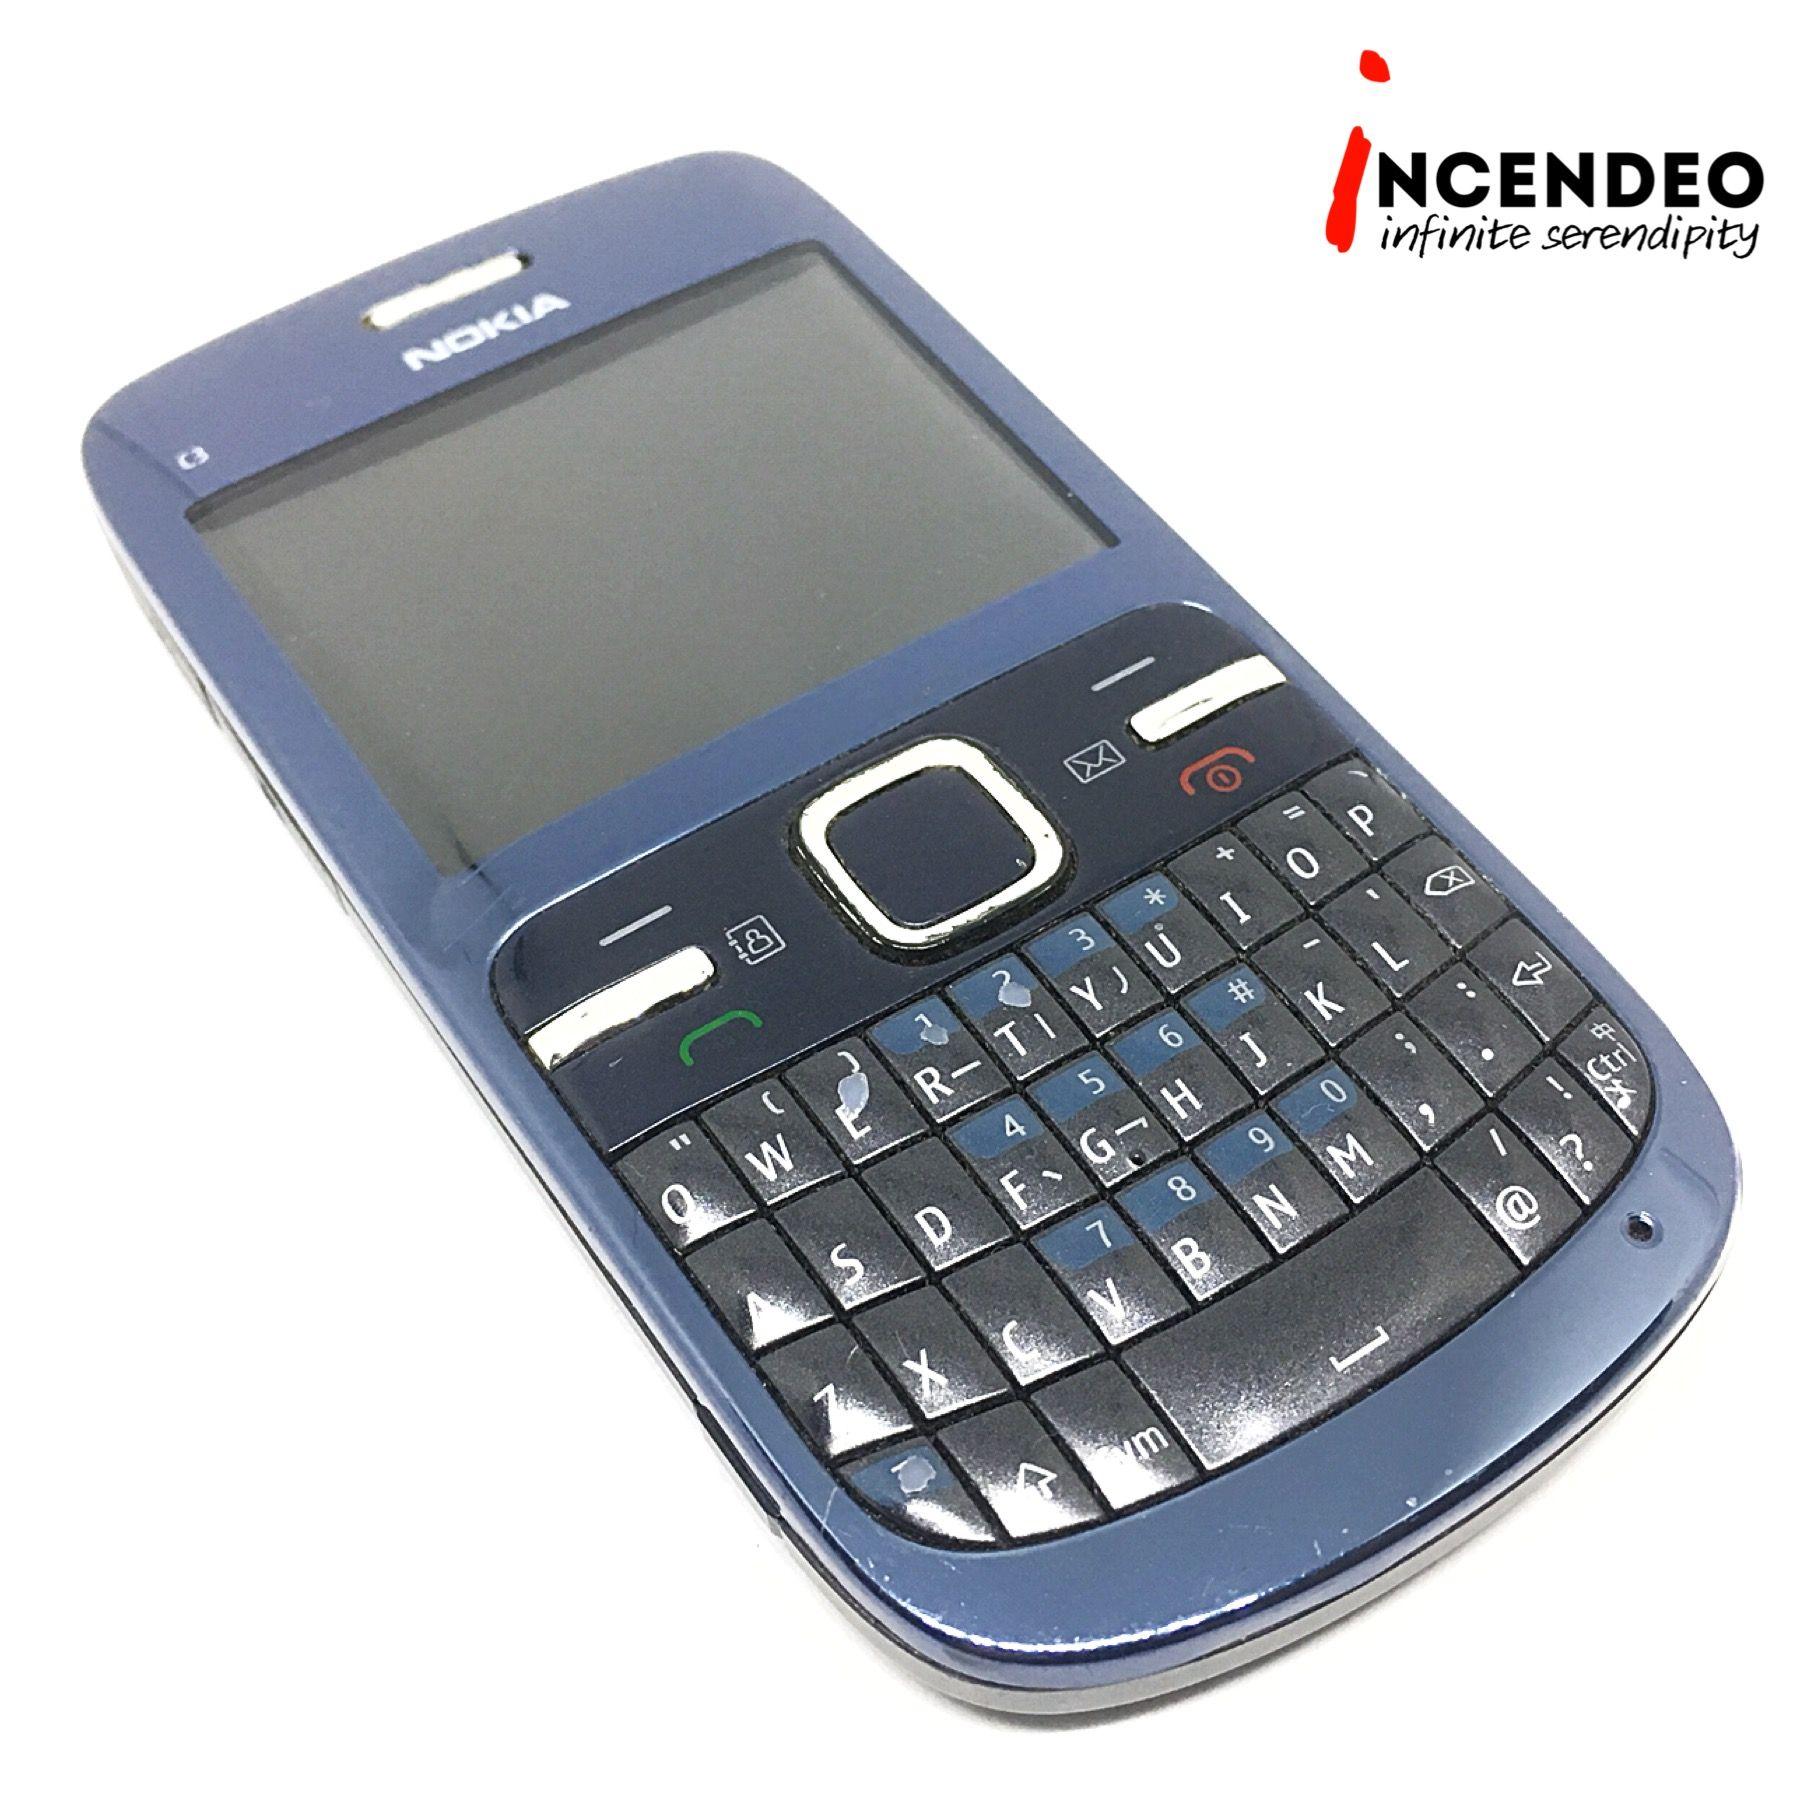 Nokia C3 Mobile Phone Nokia Mobile Phone Cellphone Handphone